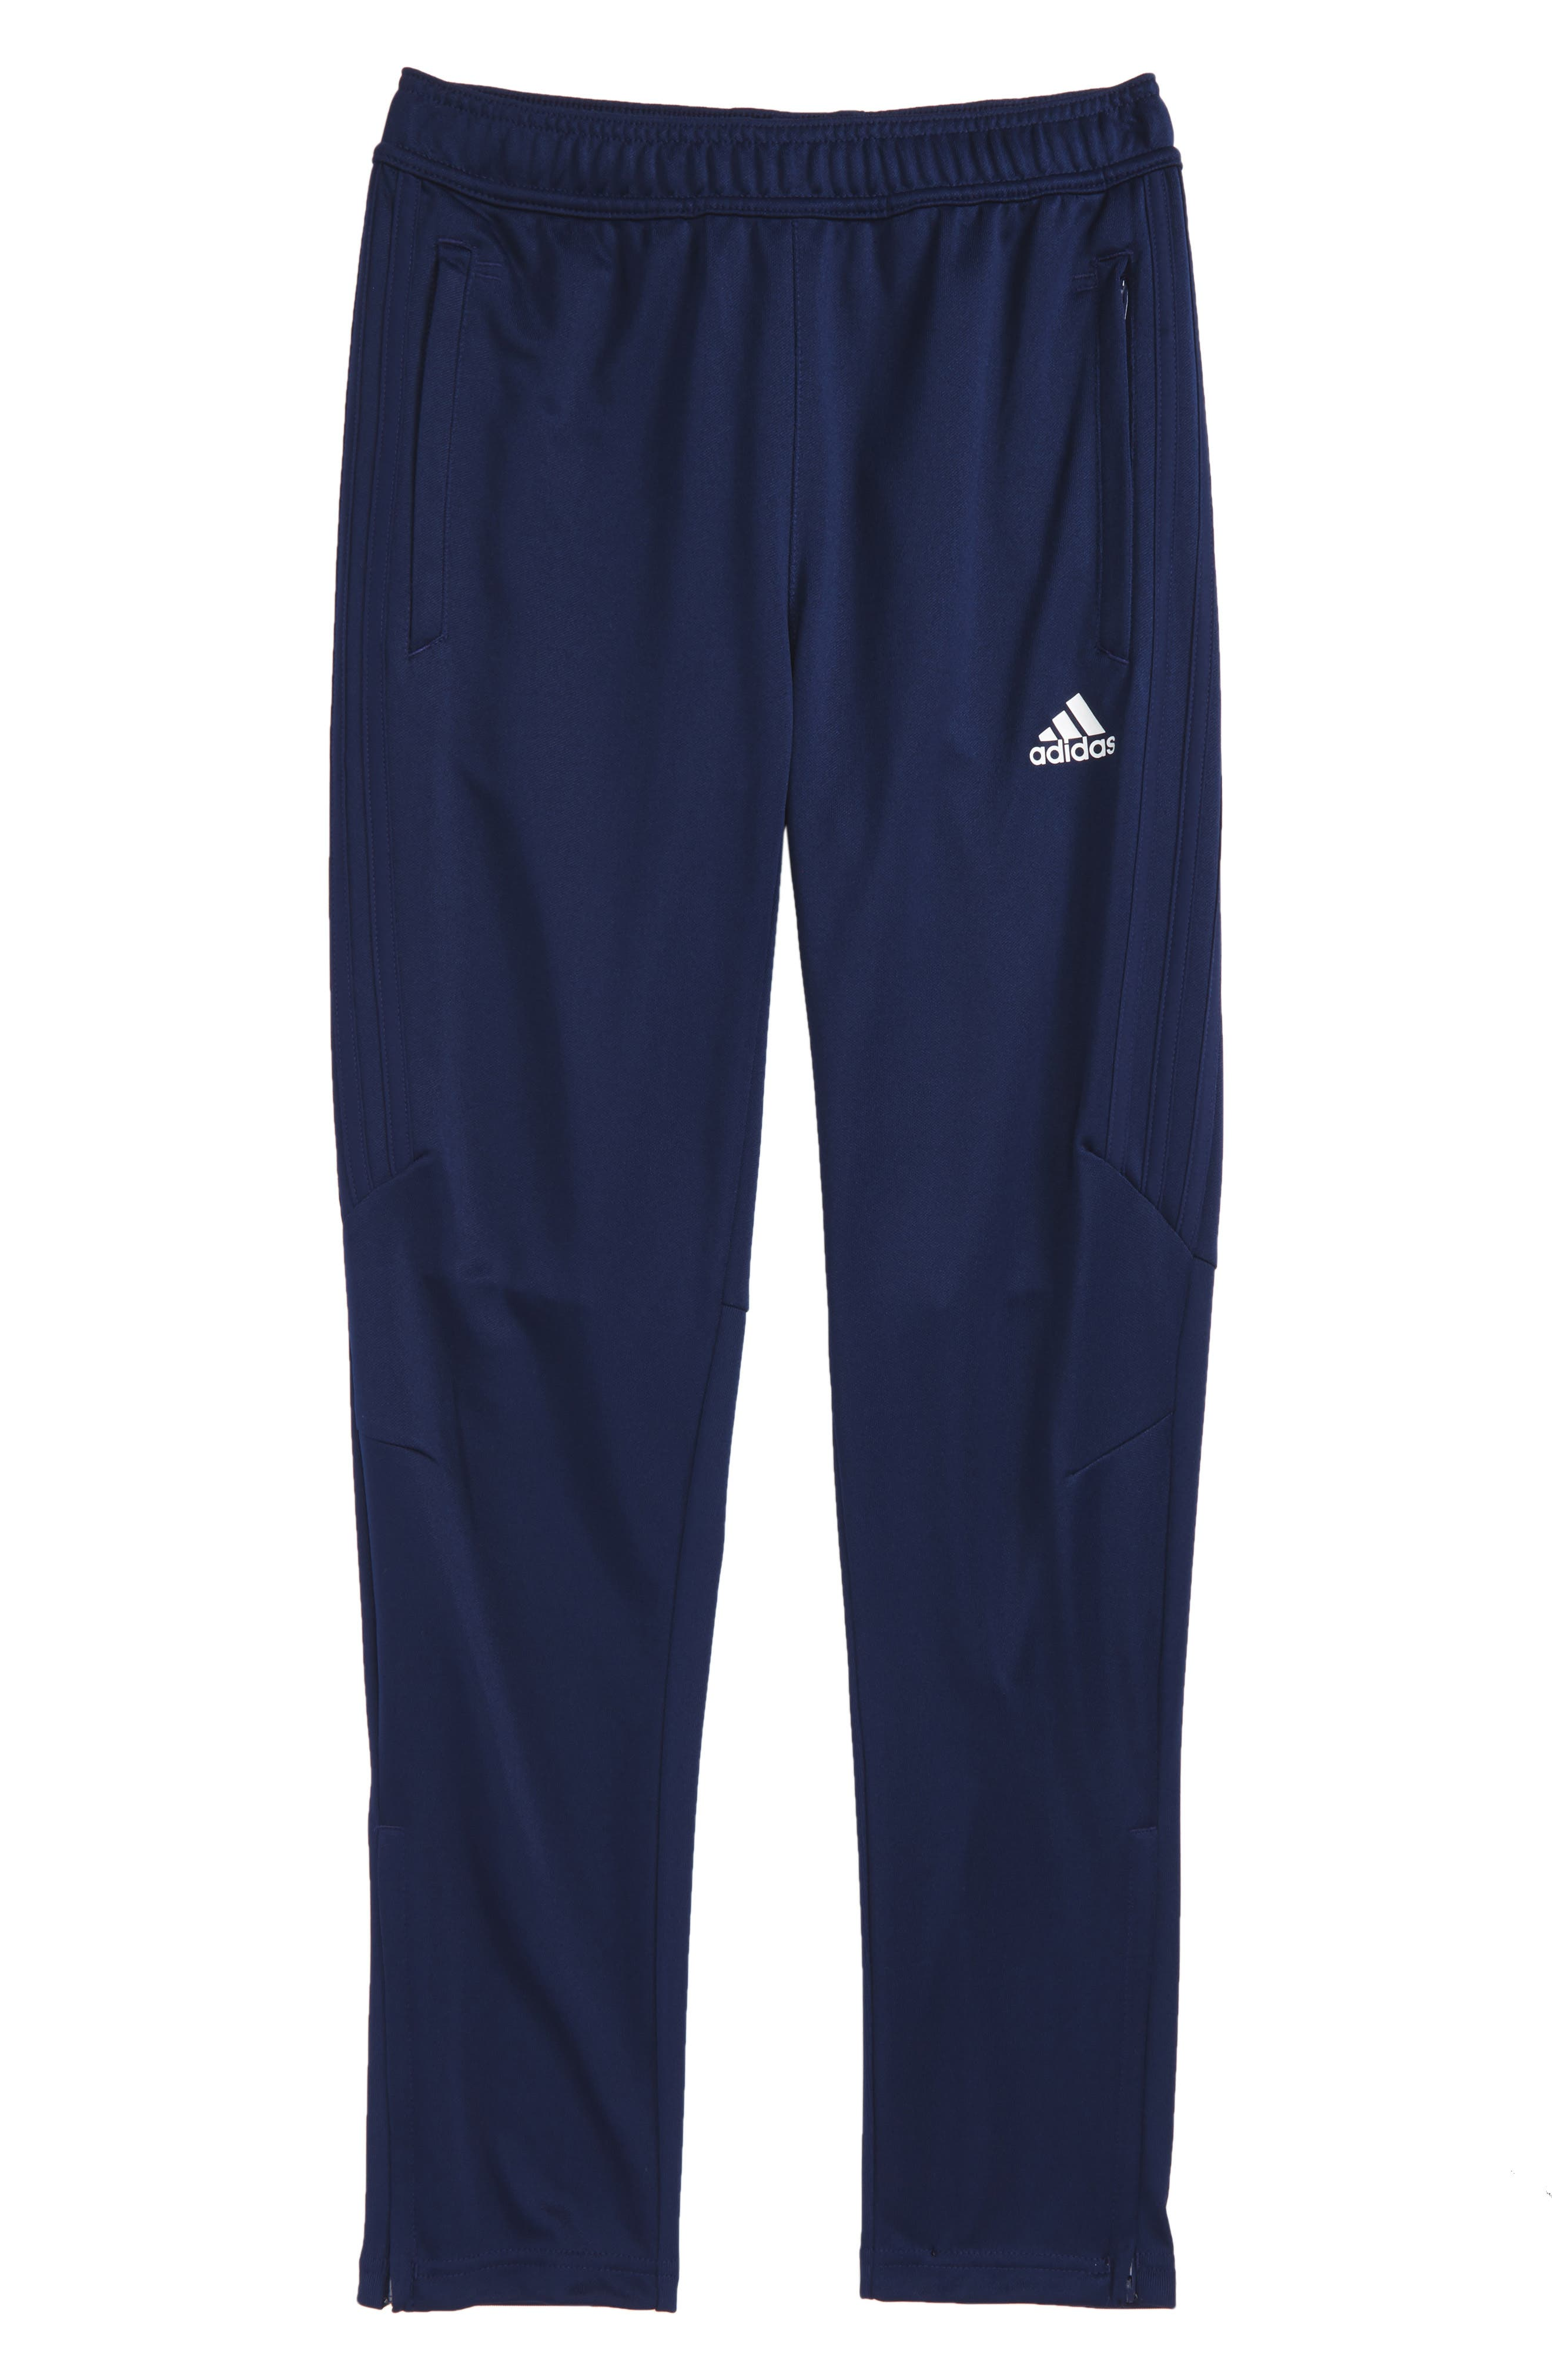 adidas Originals Tiro 17 Training Pants (Little Boys \u0026 Big Boys)